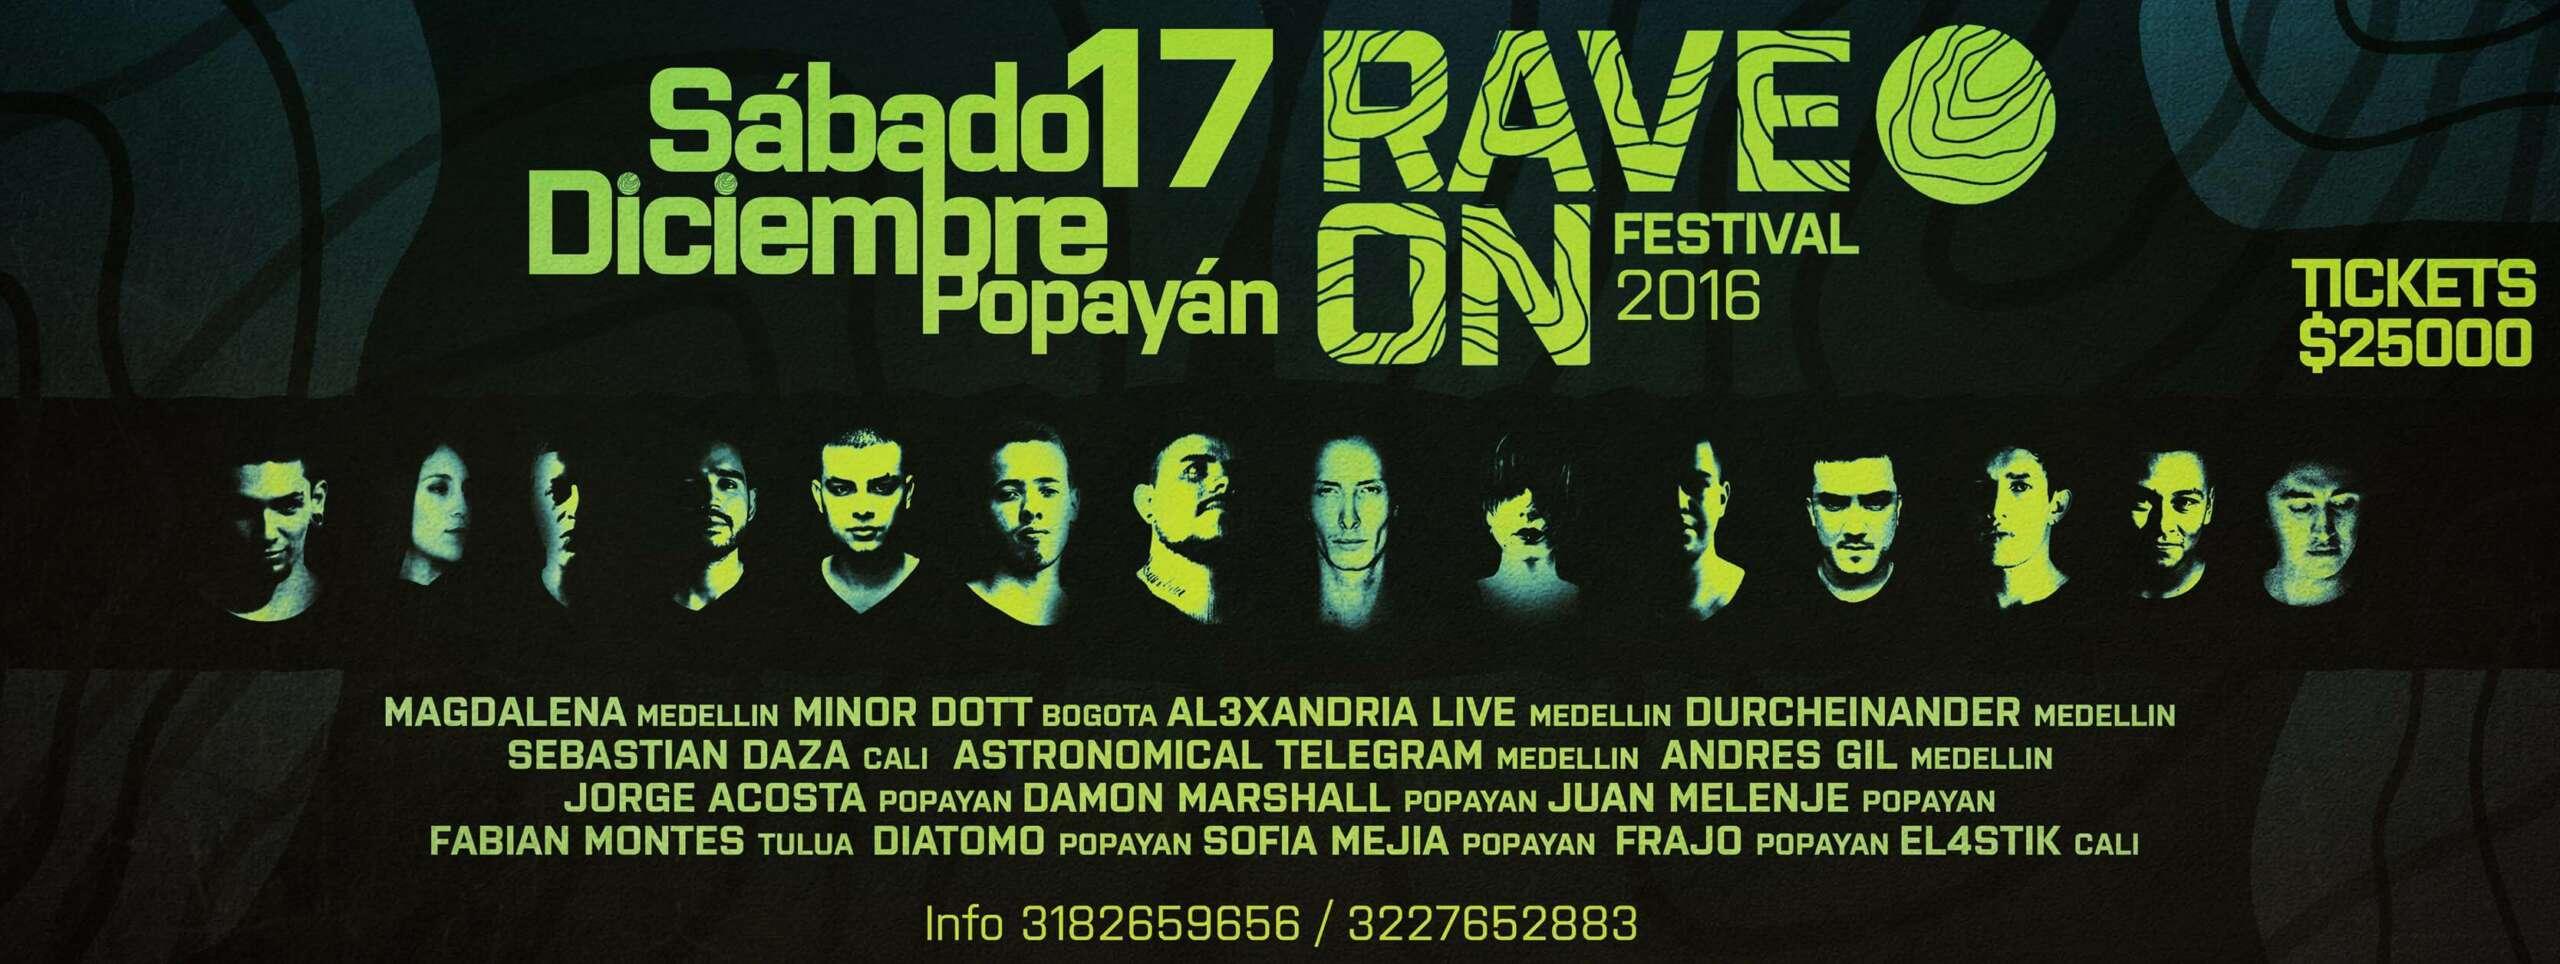 Rave On Festival Popayán 2016 se une a una buena causa.